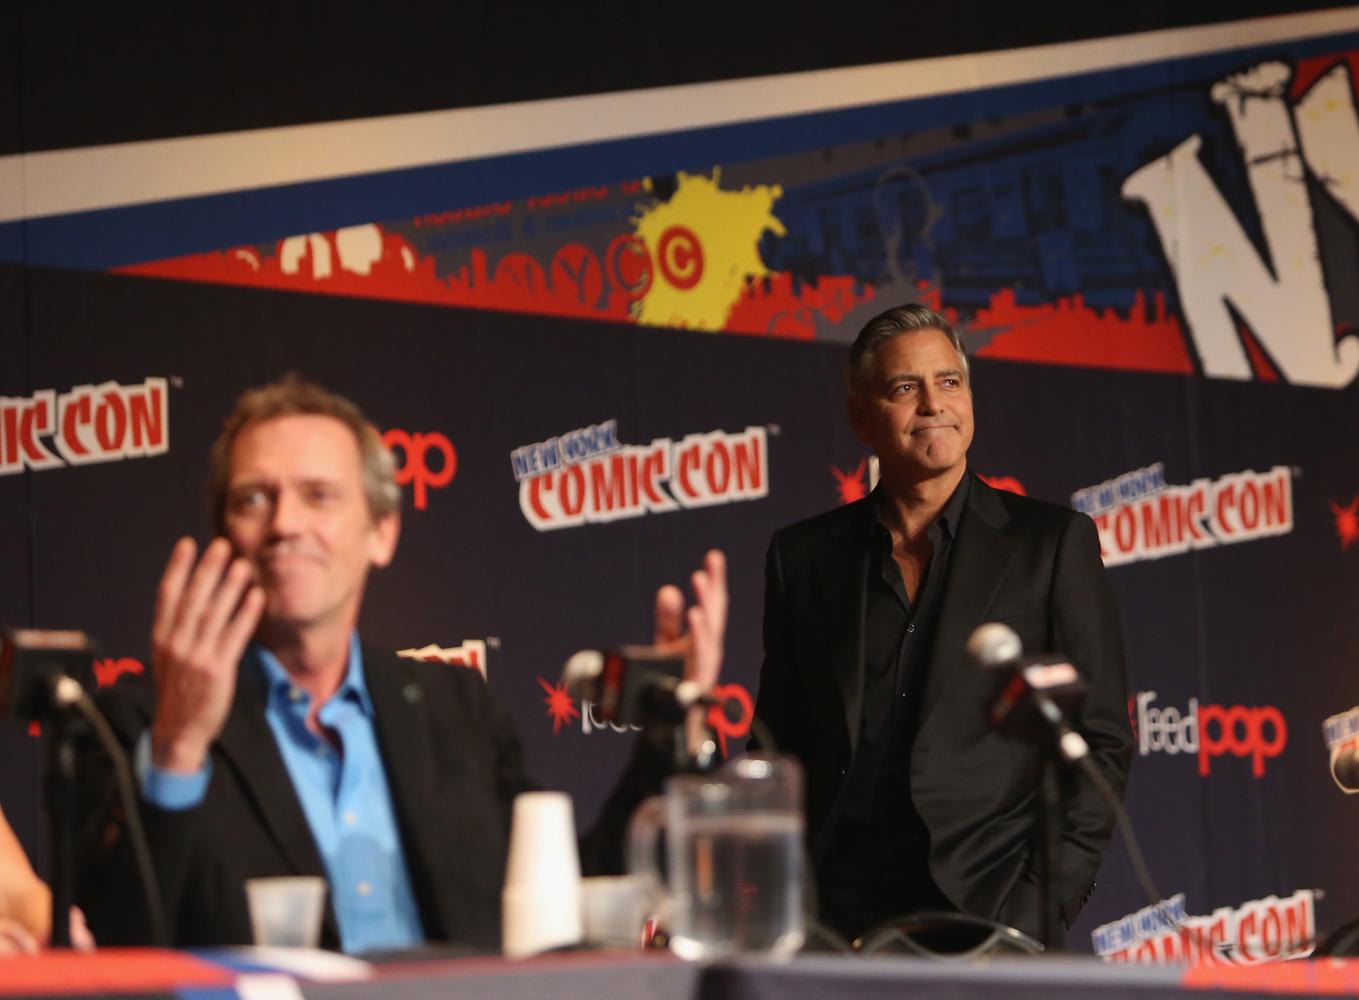 Clooney surprises Comic Con / image via timeoutny.com